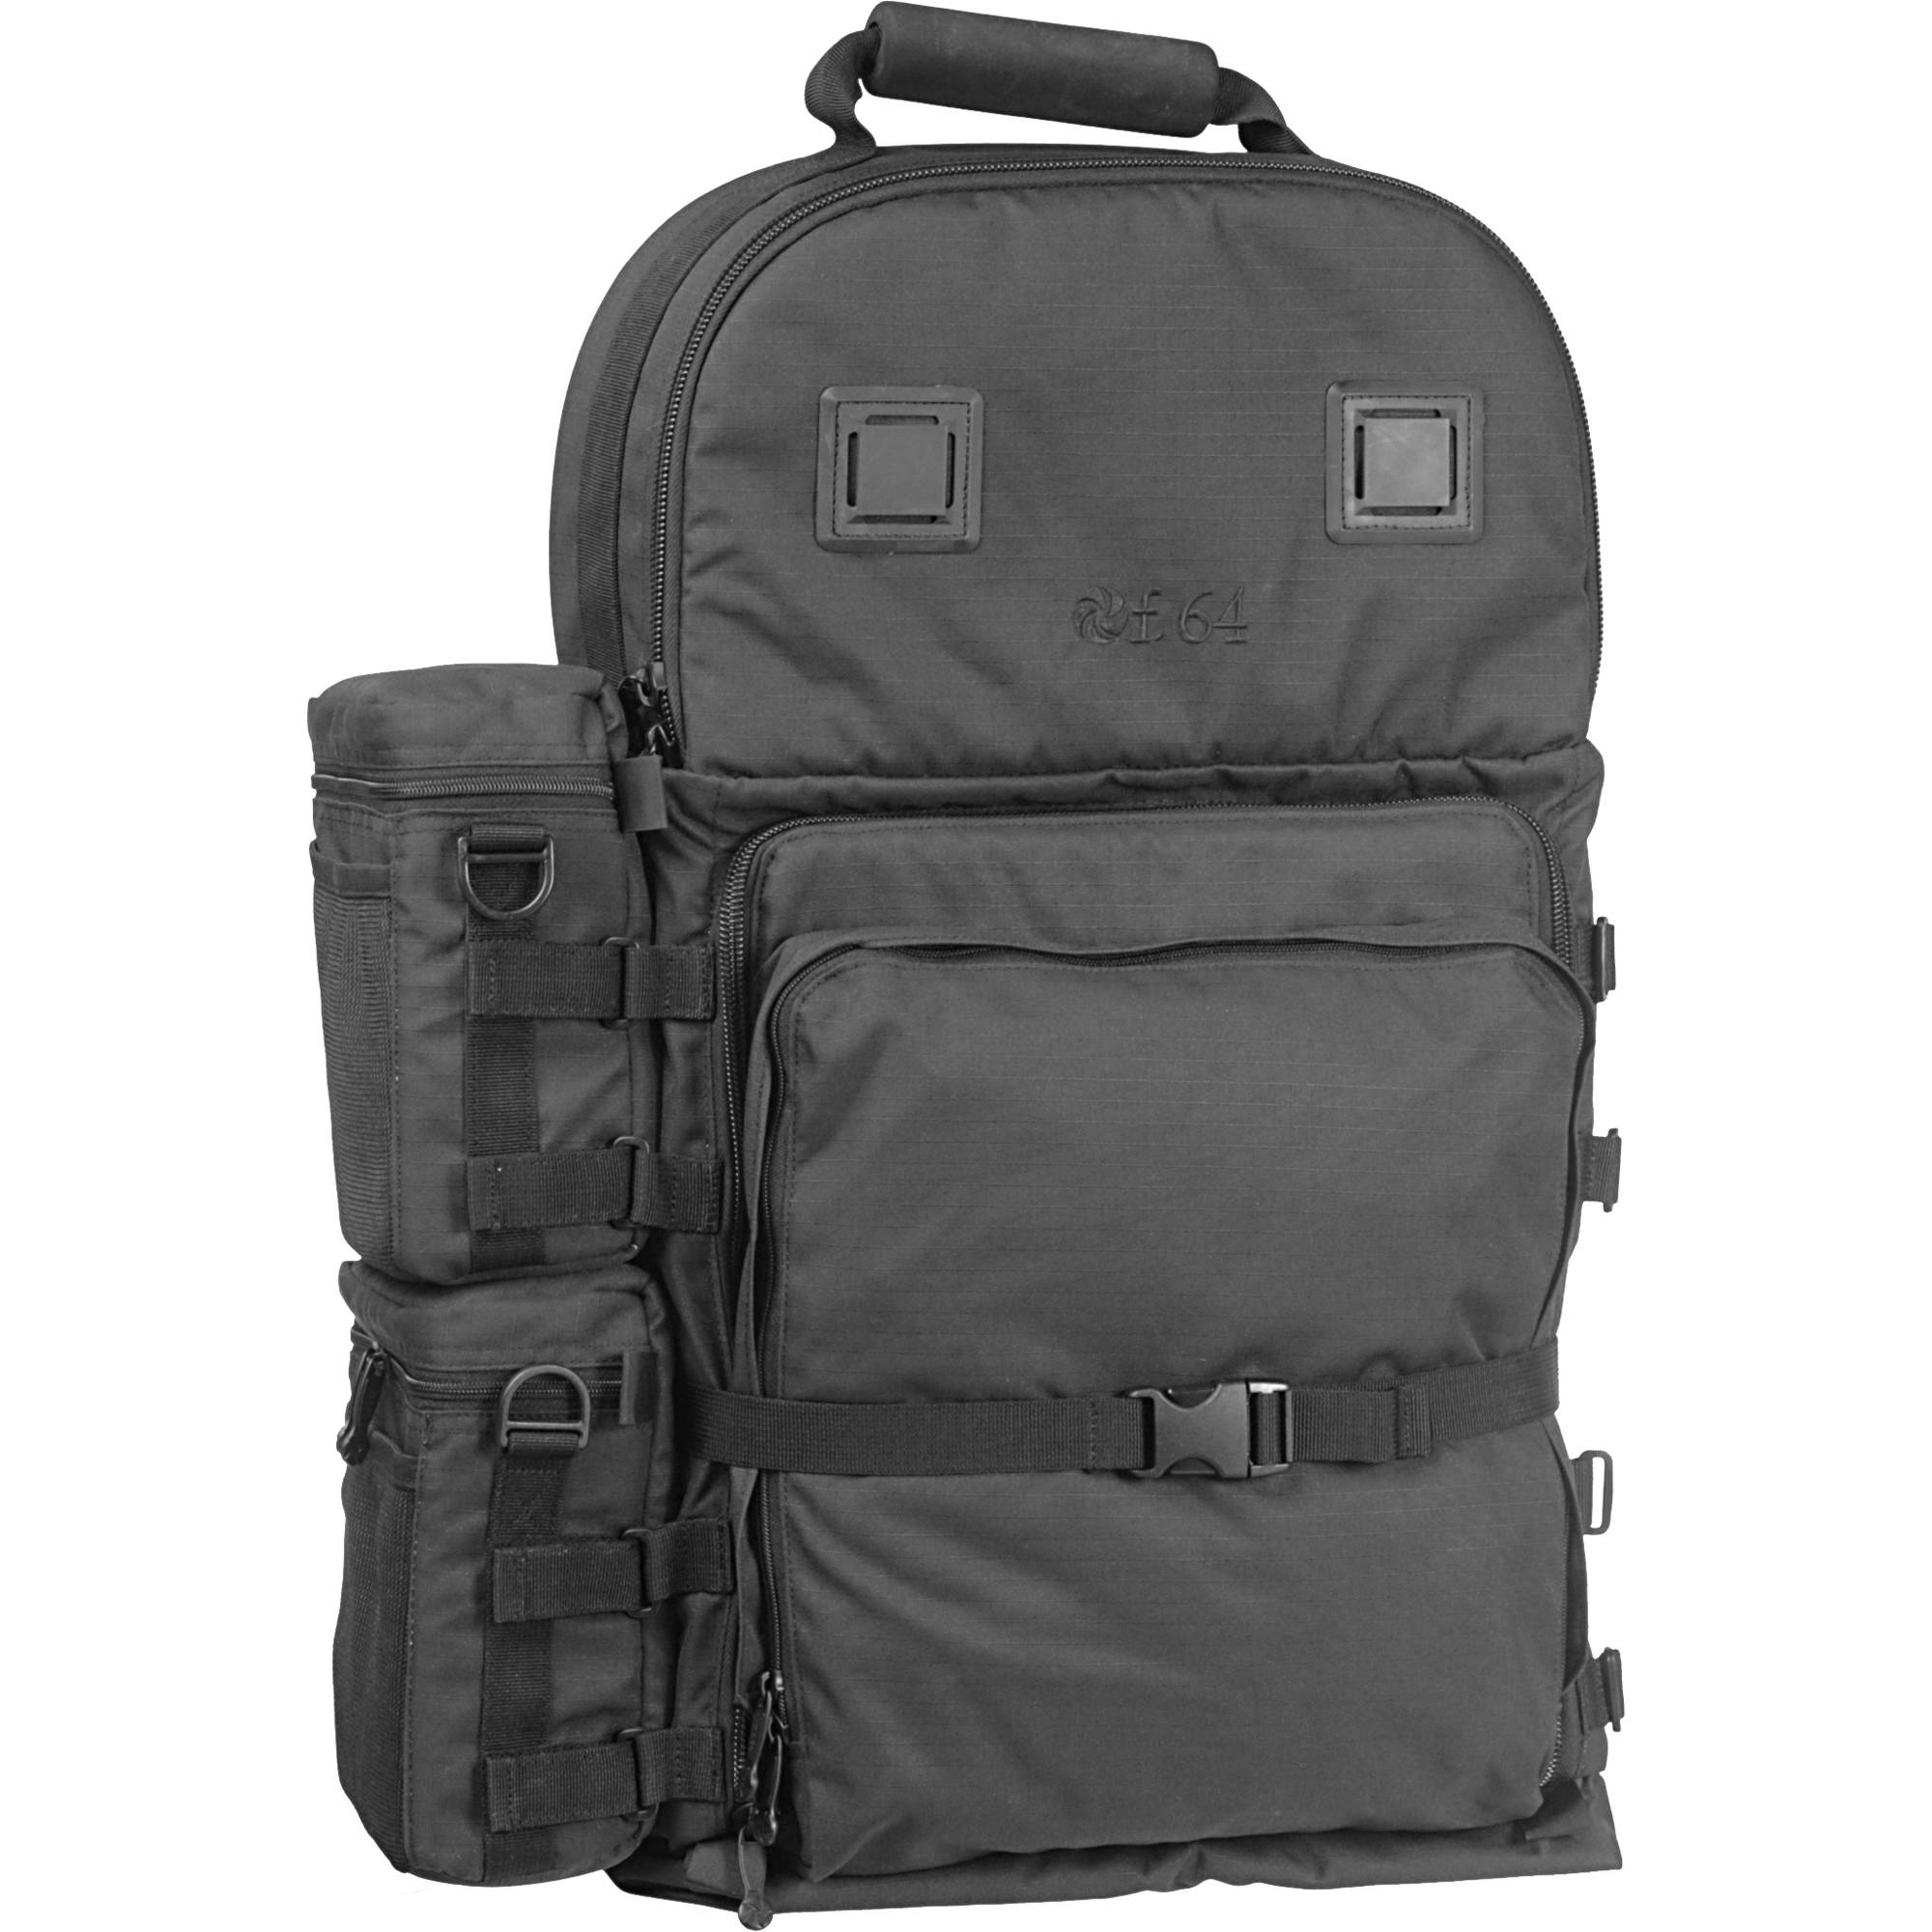 bpx extra large backpack black bpxb b h photo video. Black Bedroom Furniture Sets. Home Design Ideas